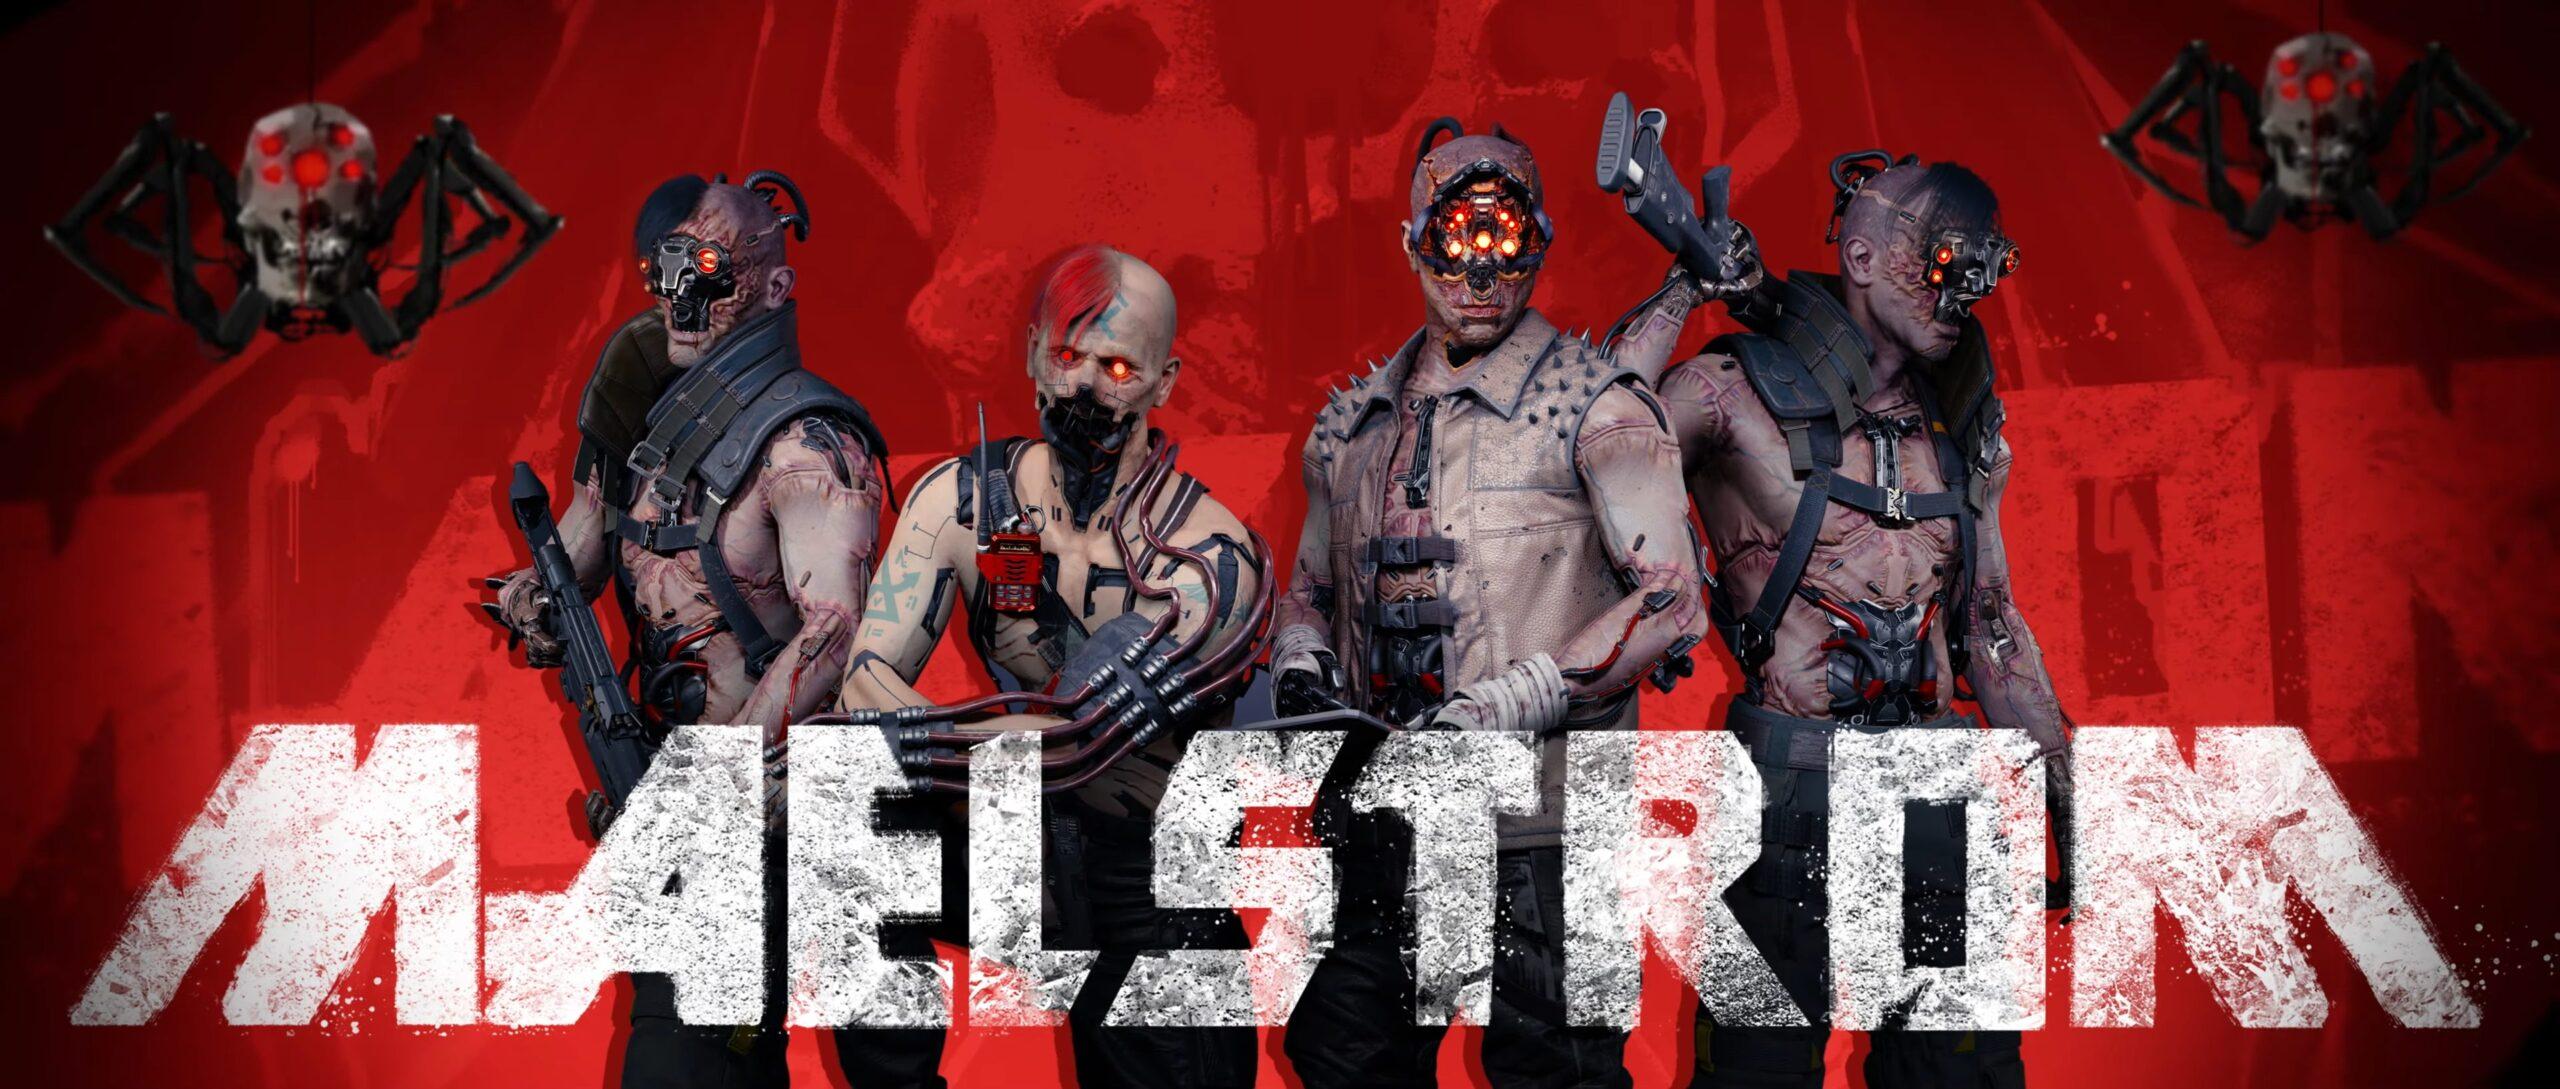 Cyberpunk 2077 — Gangs Of Night City Maelstrom